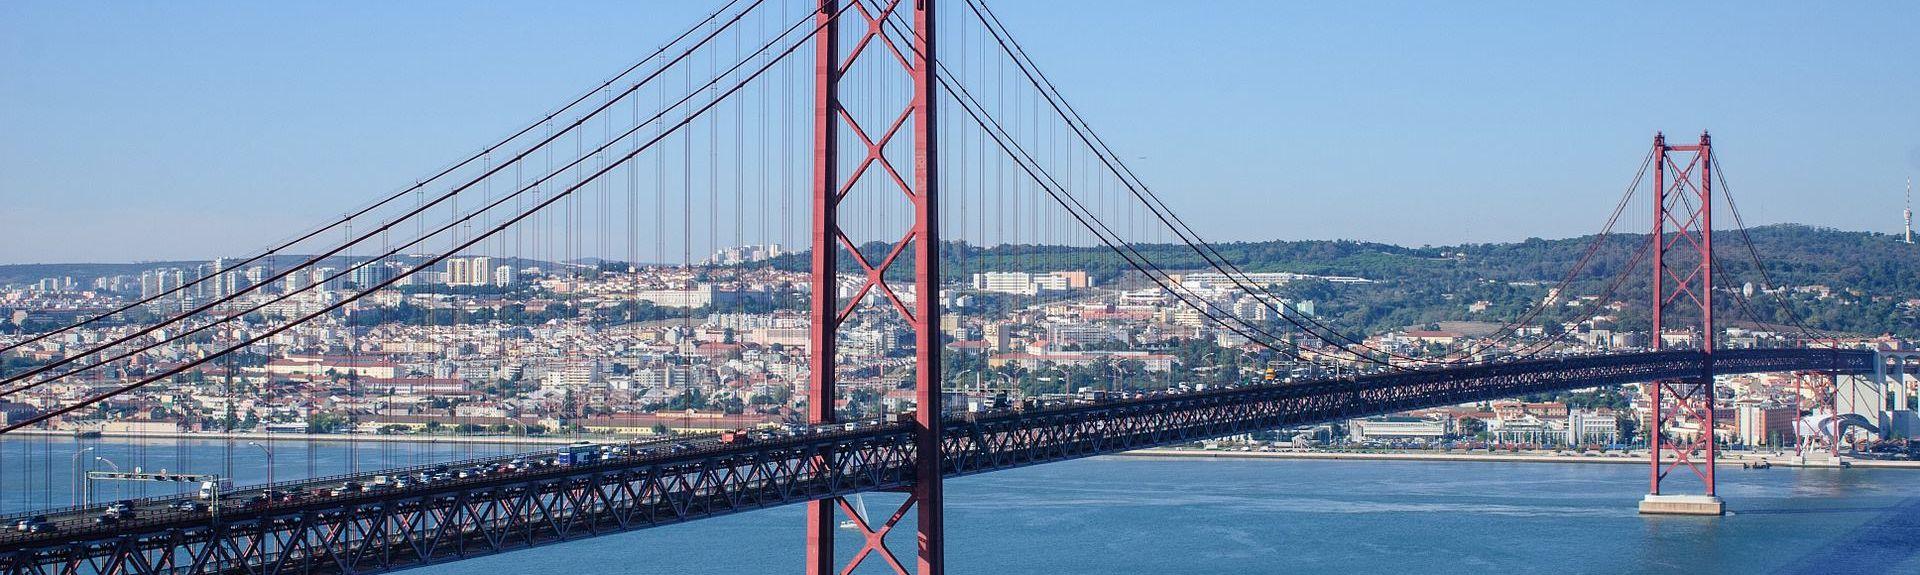 Trafaria, District de Setúbal, Portugal